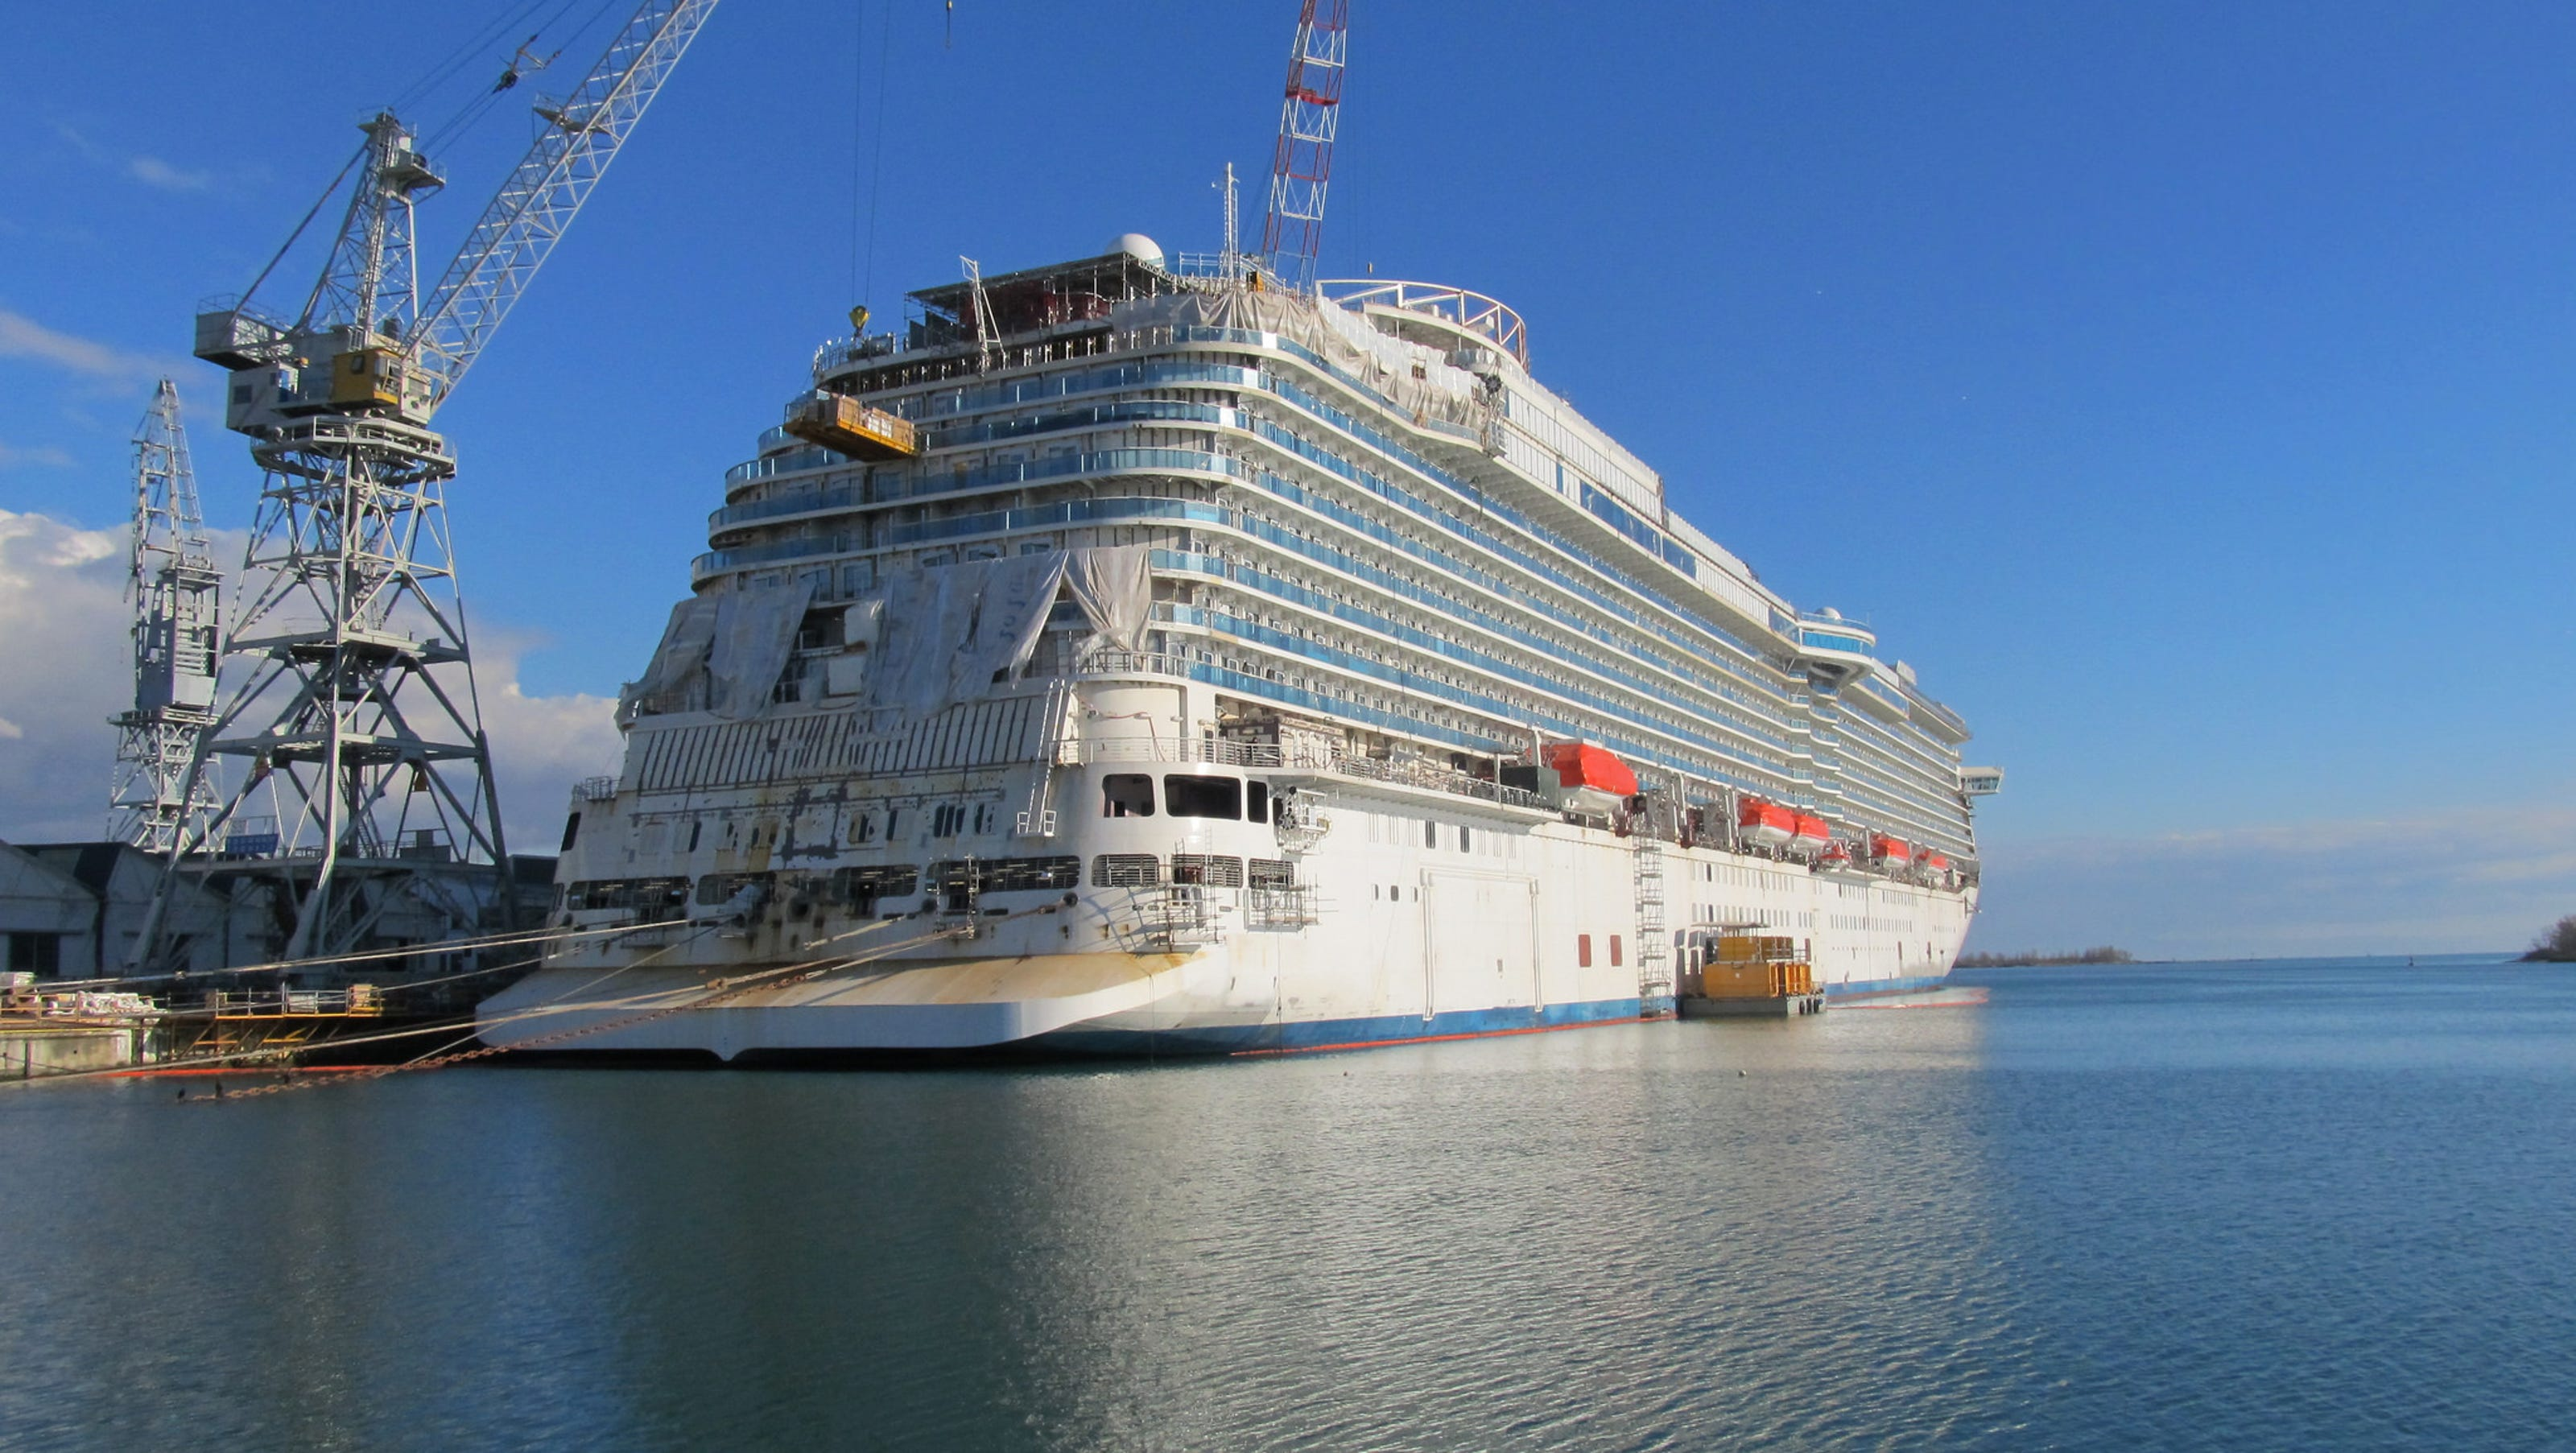 Photo Tour A Sneak Peek At Princess Cruises Next Ship